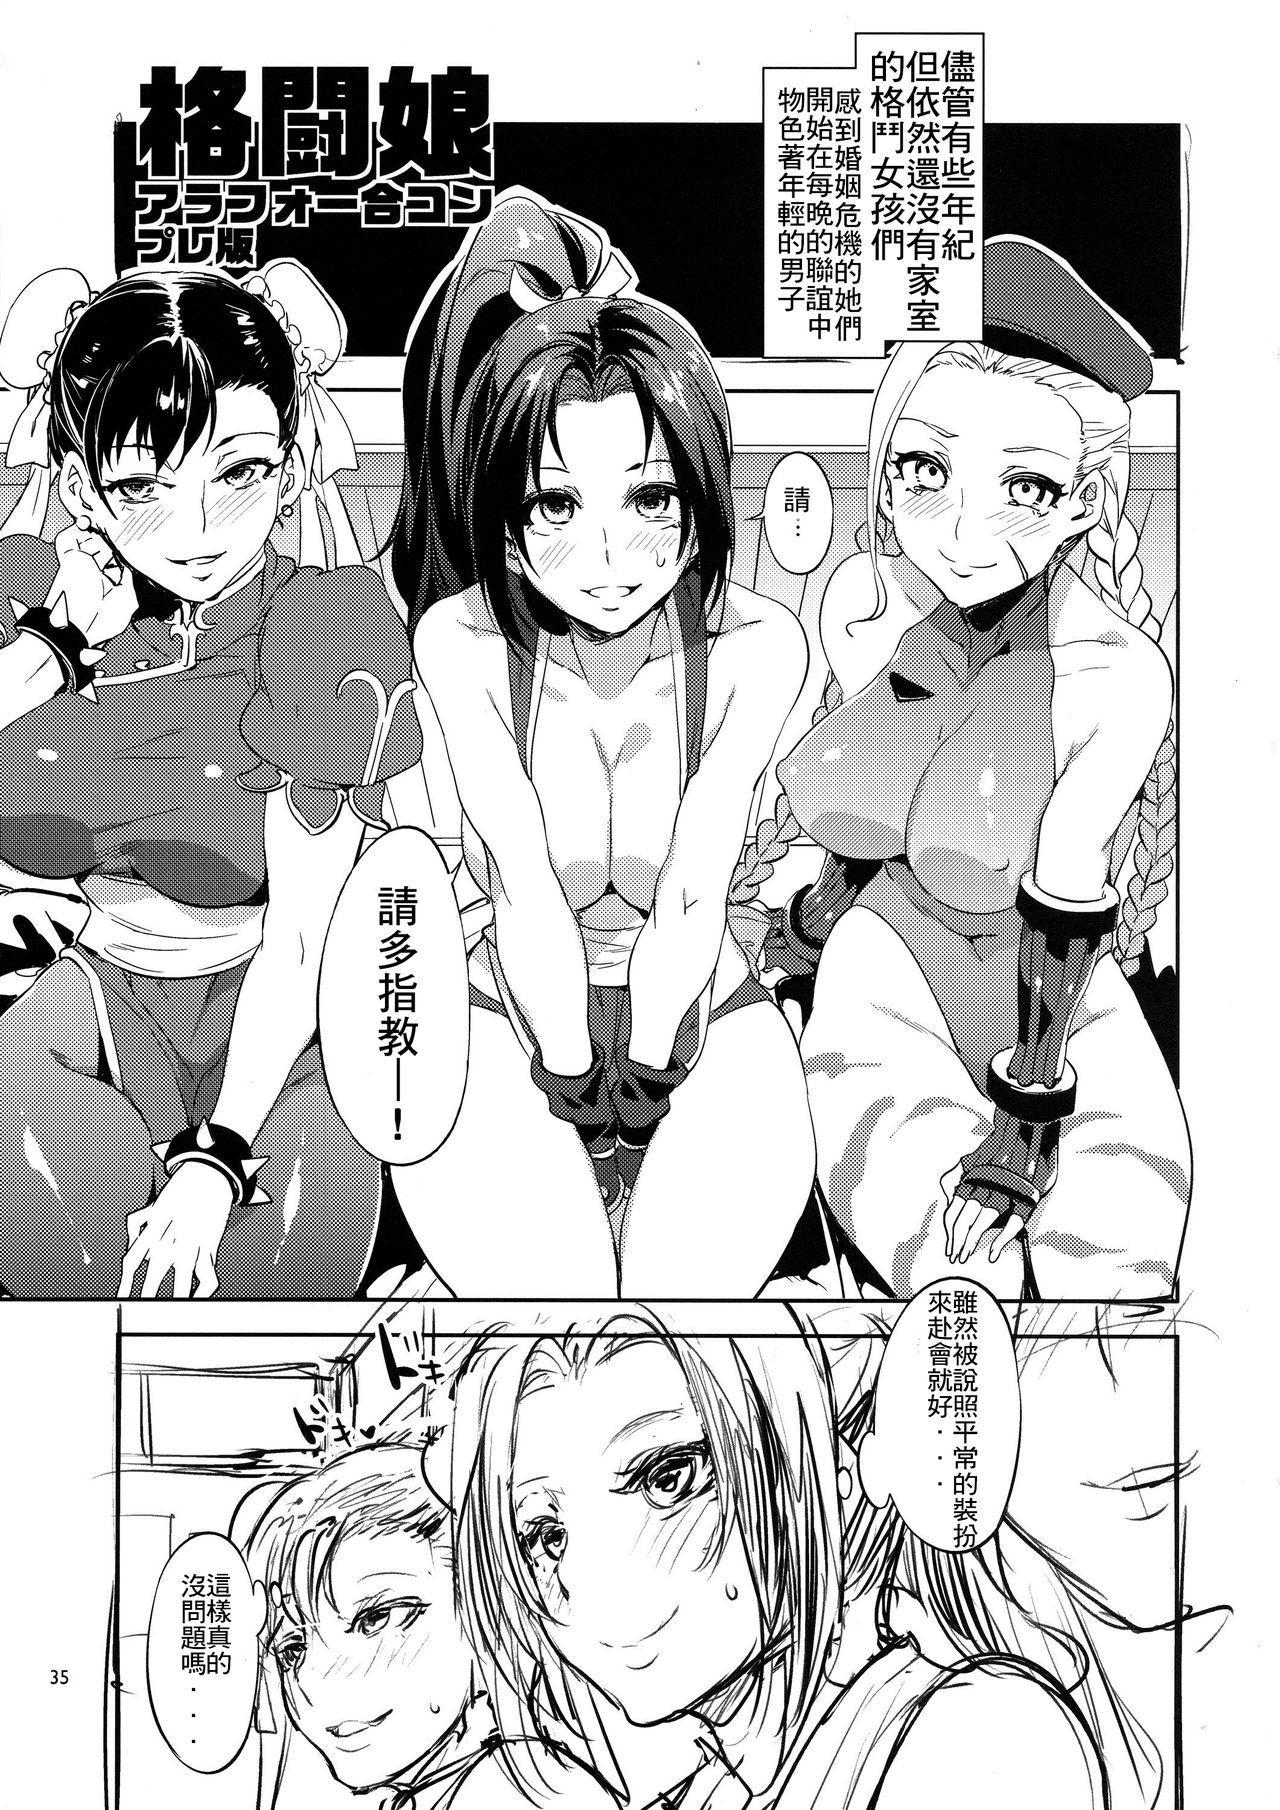 Kakutou Musume Yarimoku Goukon | 格鬥女孩的幹砲聯誼 34